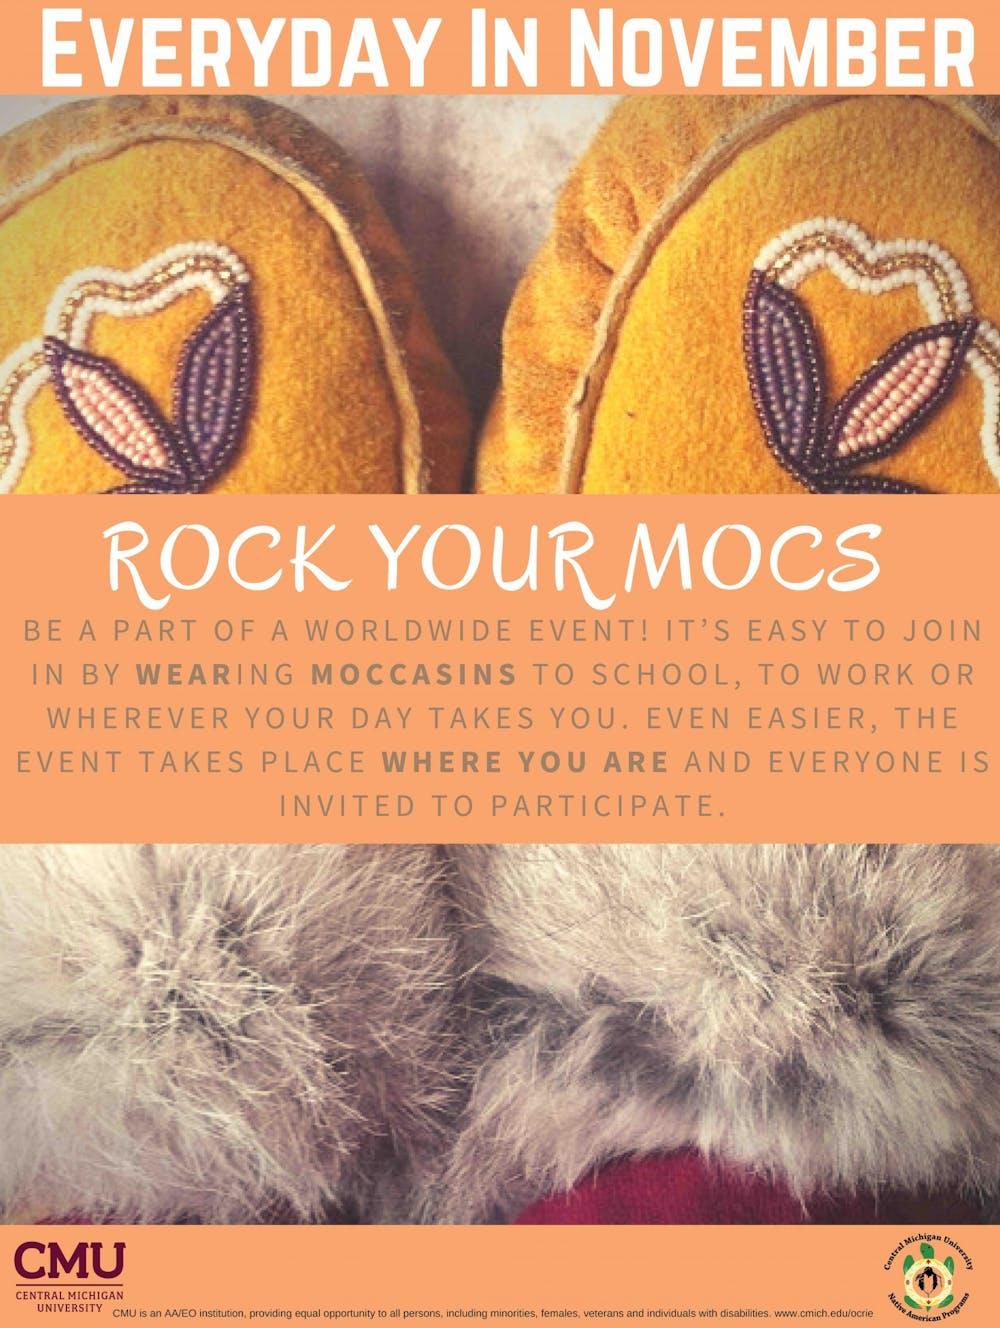 rock-your-mocs